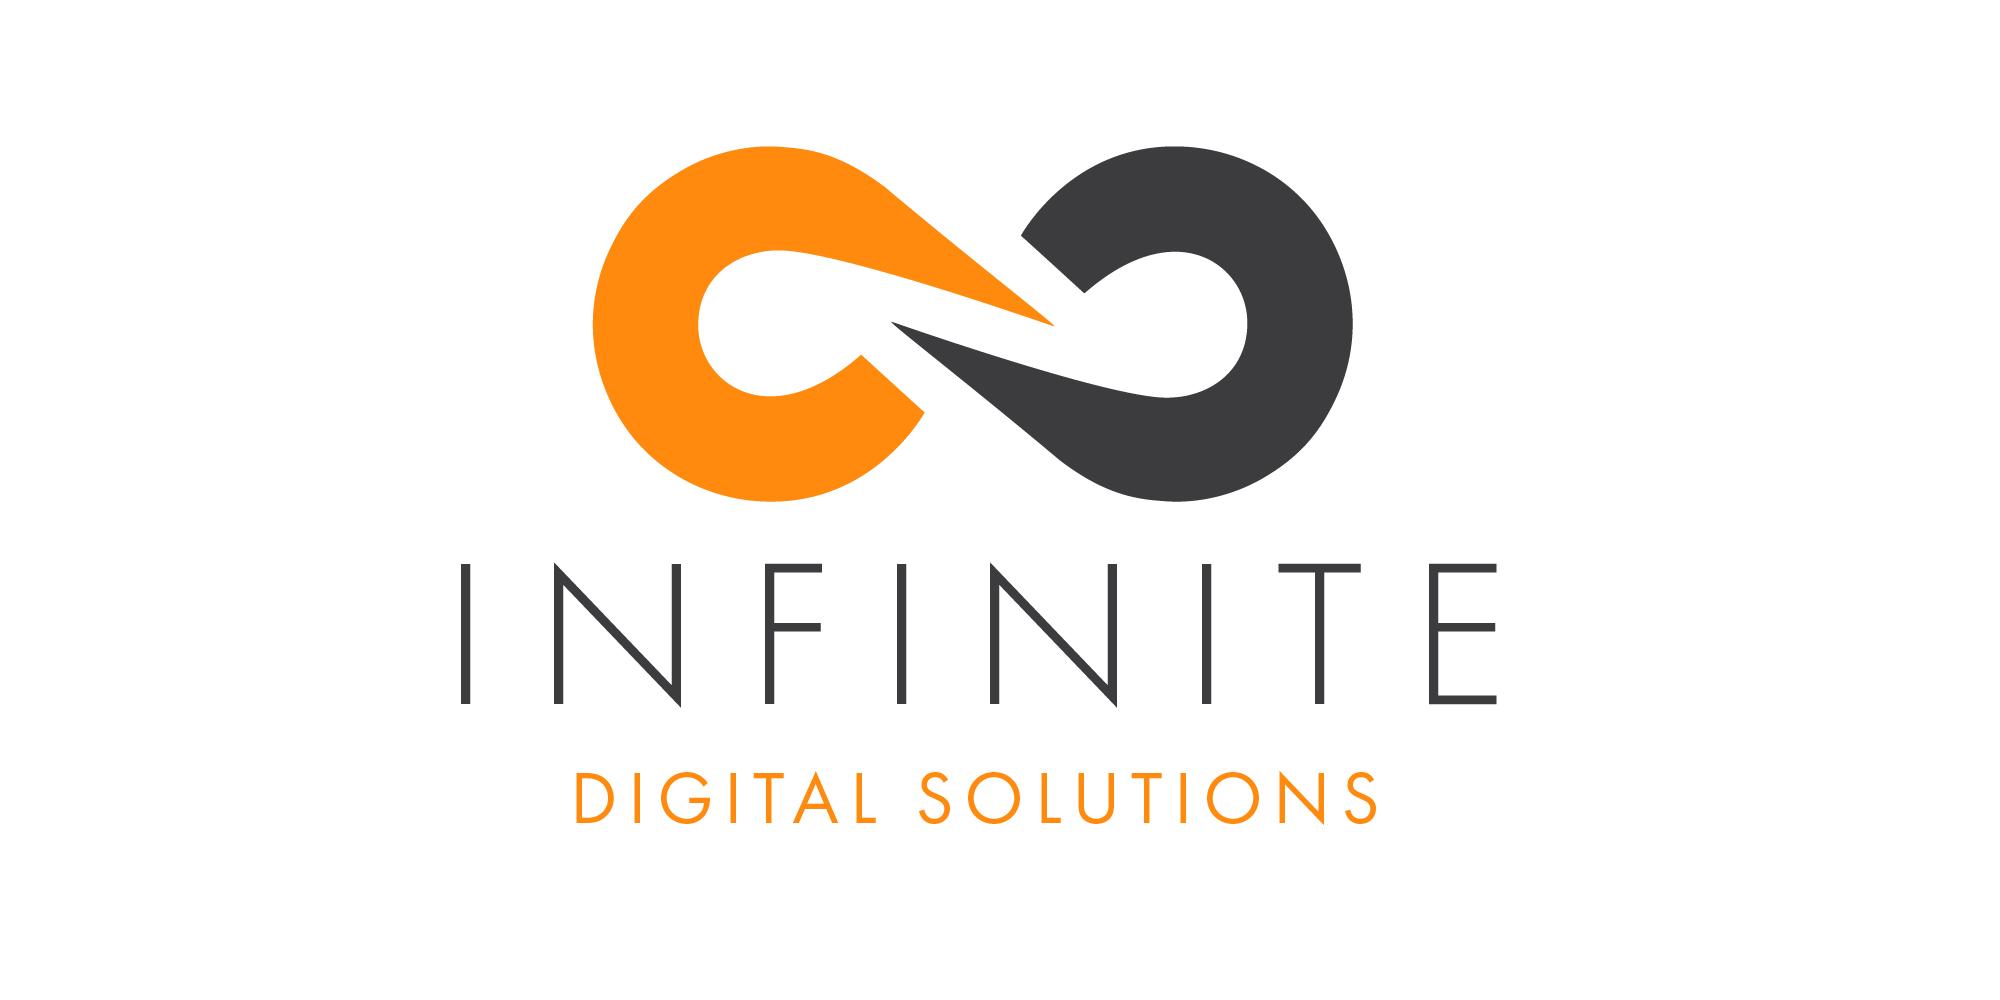 Infinite Digital Solutions